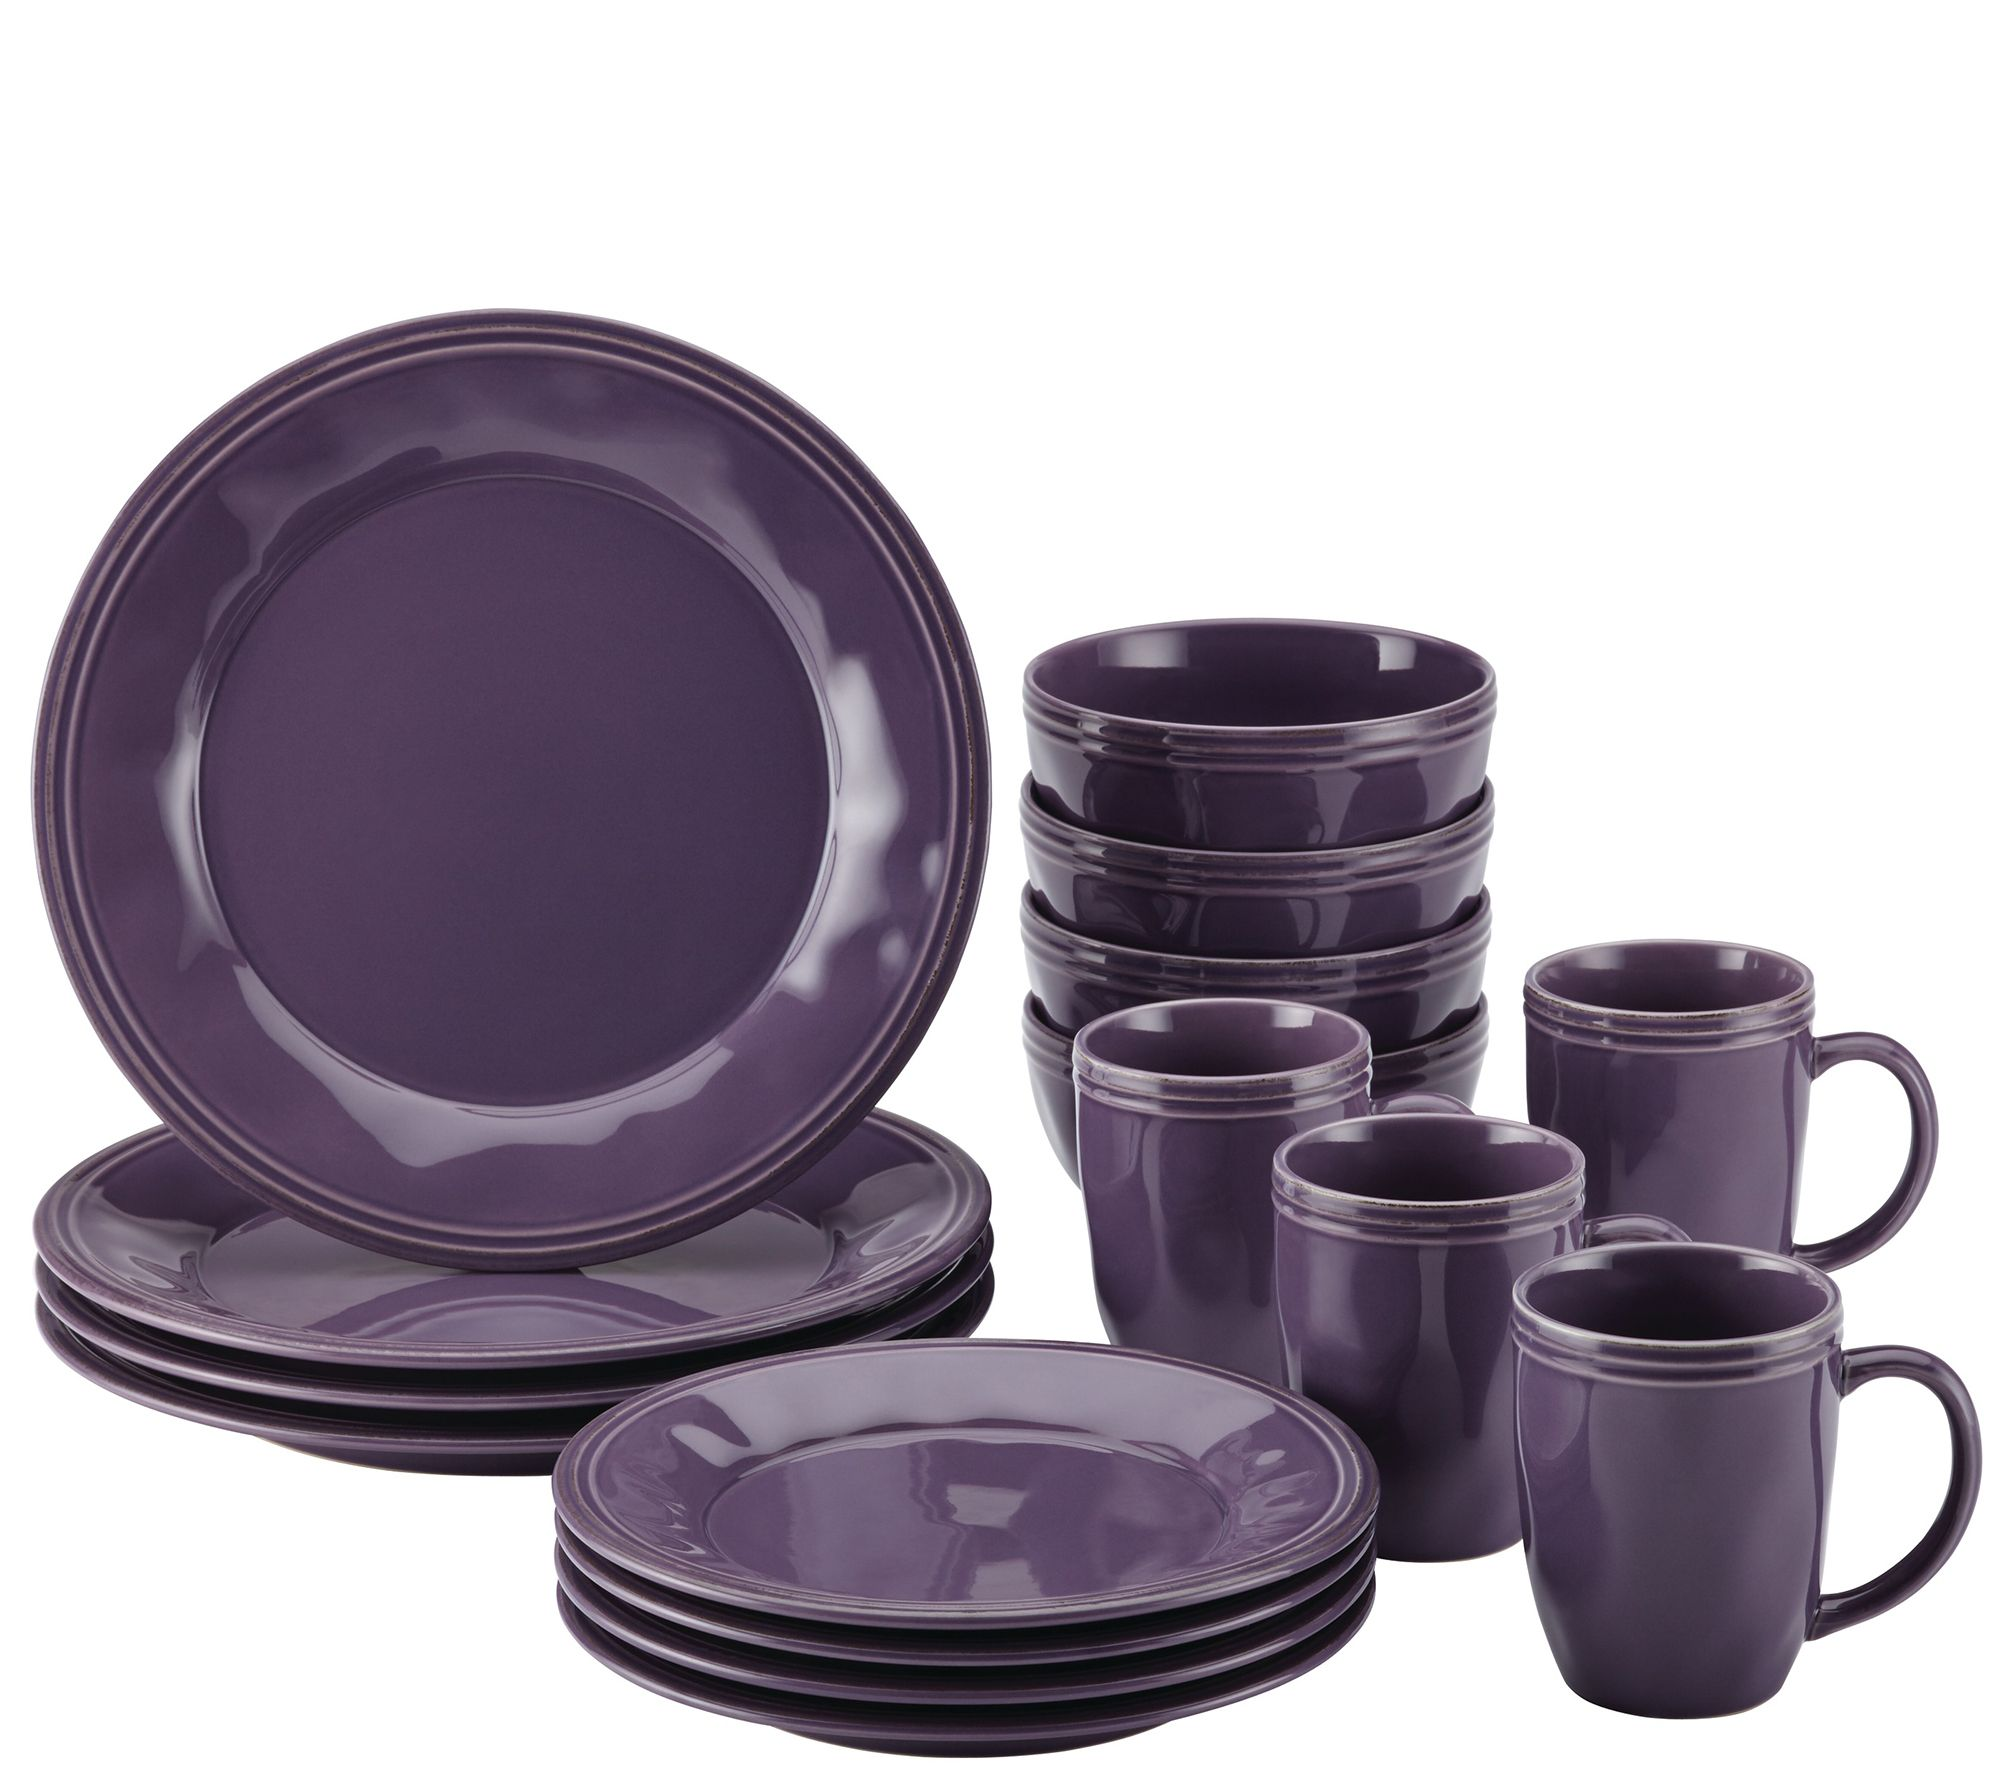 sc 1 st  QVC.com & Rachael Ray Cucina 16-Piece Stoneware Dinnerware Set - Page 1 \u2014 QVC.com